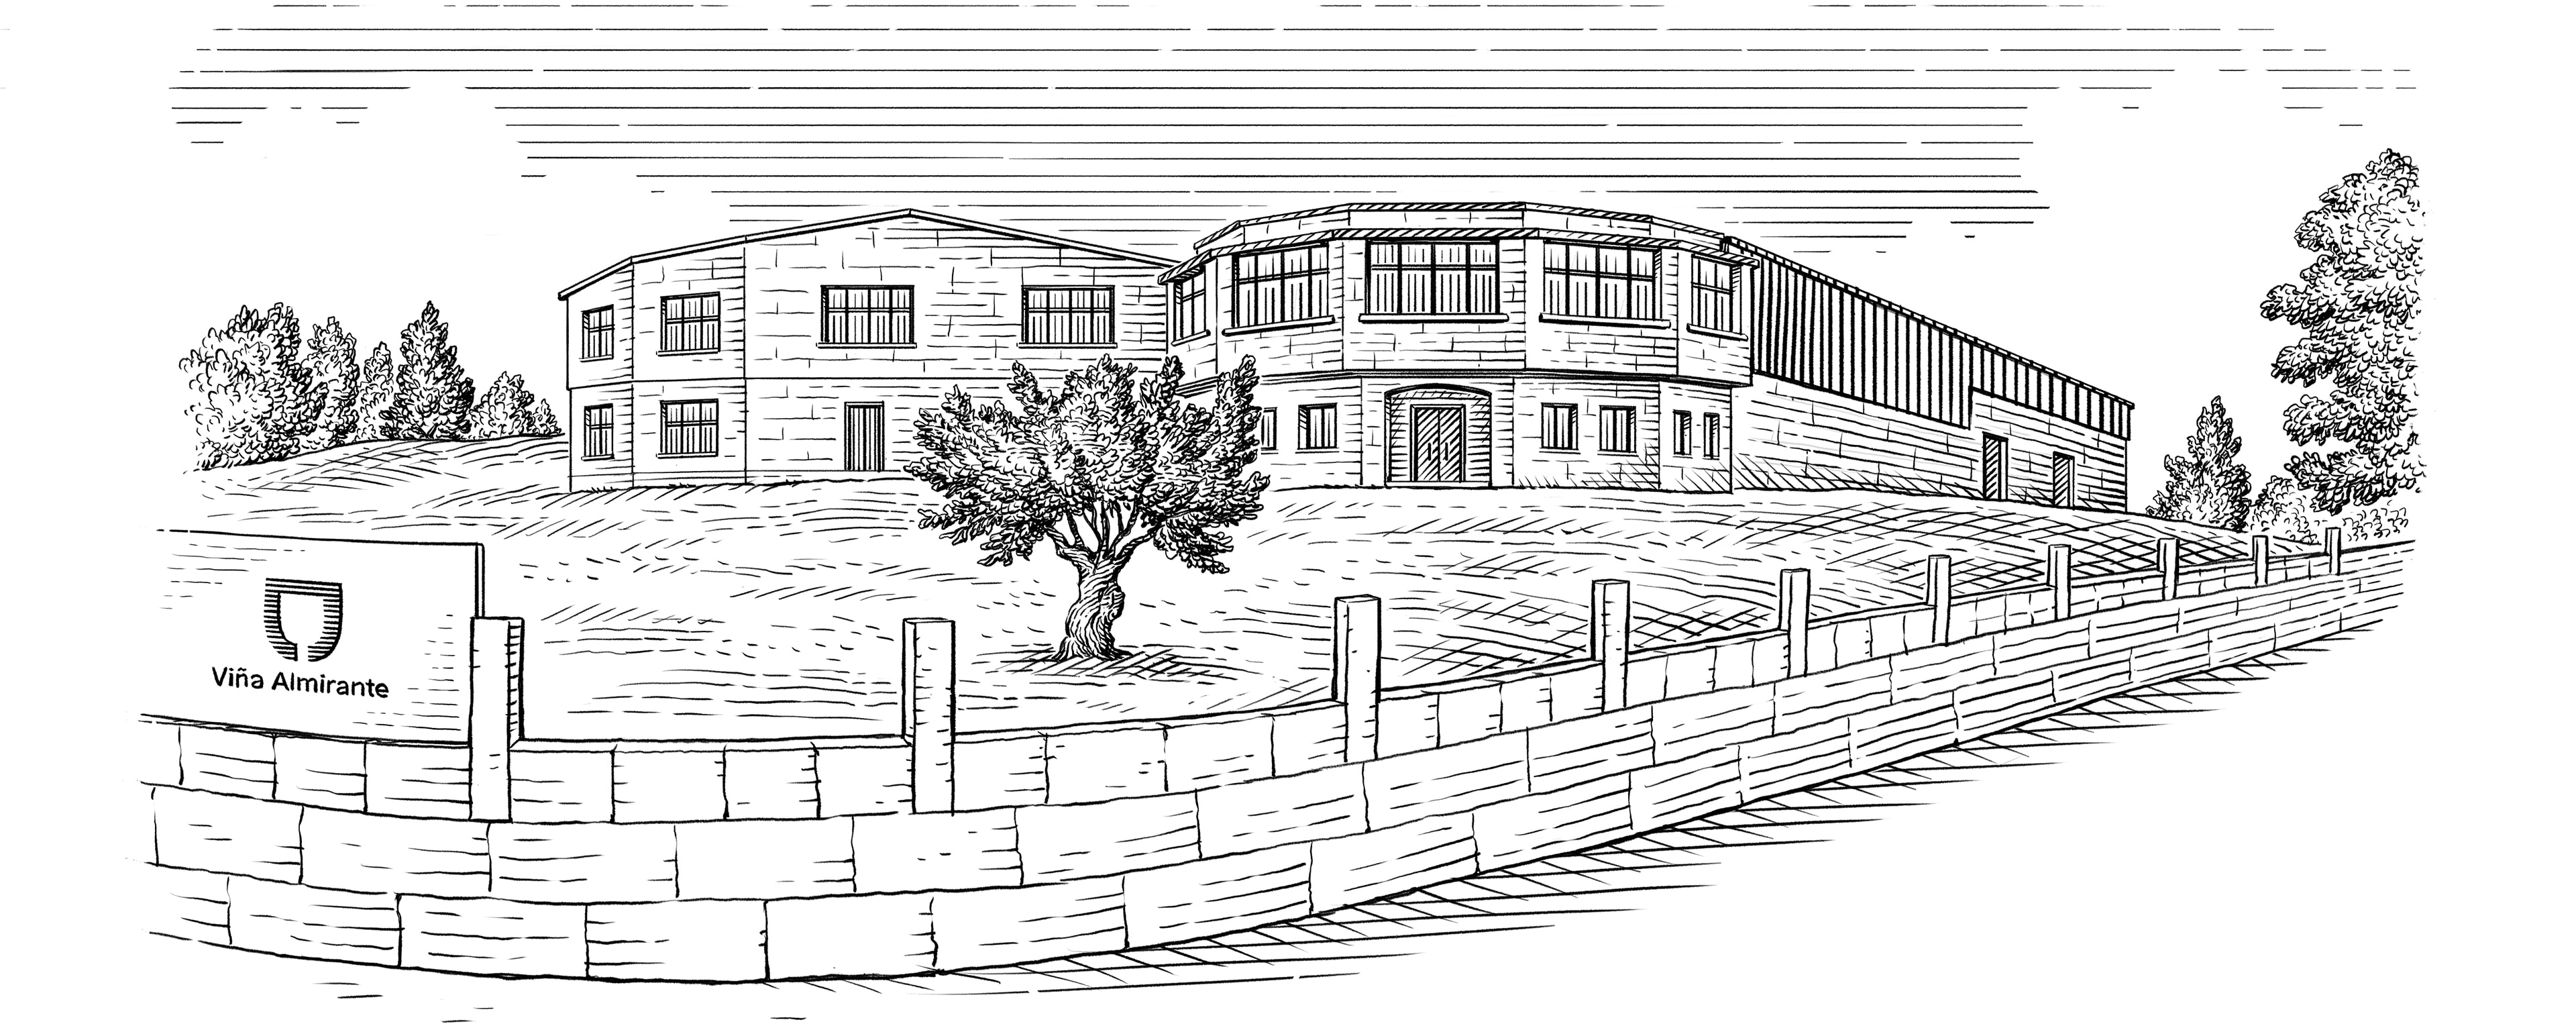 Va Bodega Ilustracion